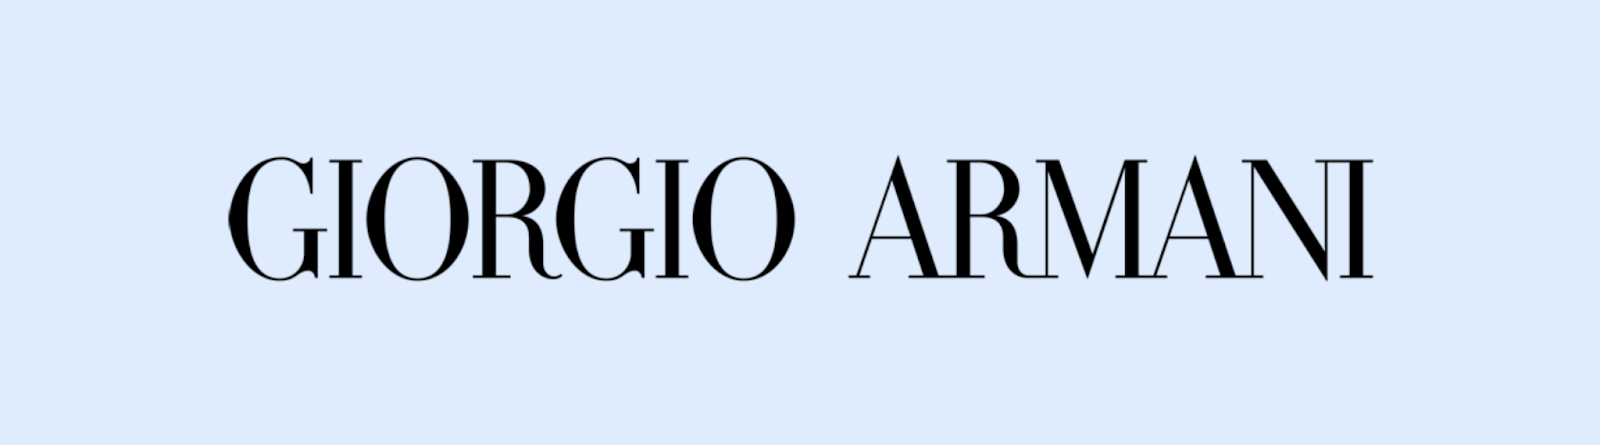 Giorgio Armani Logo family in Serif font